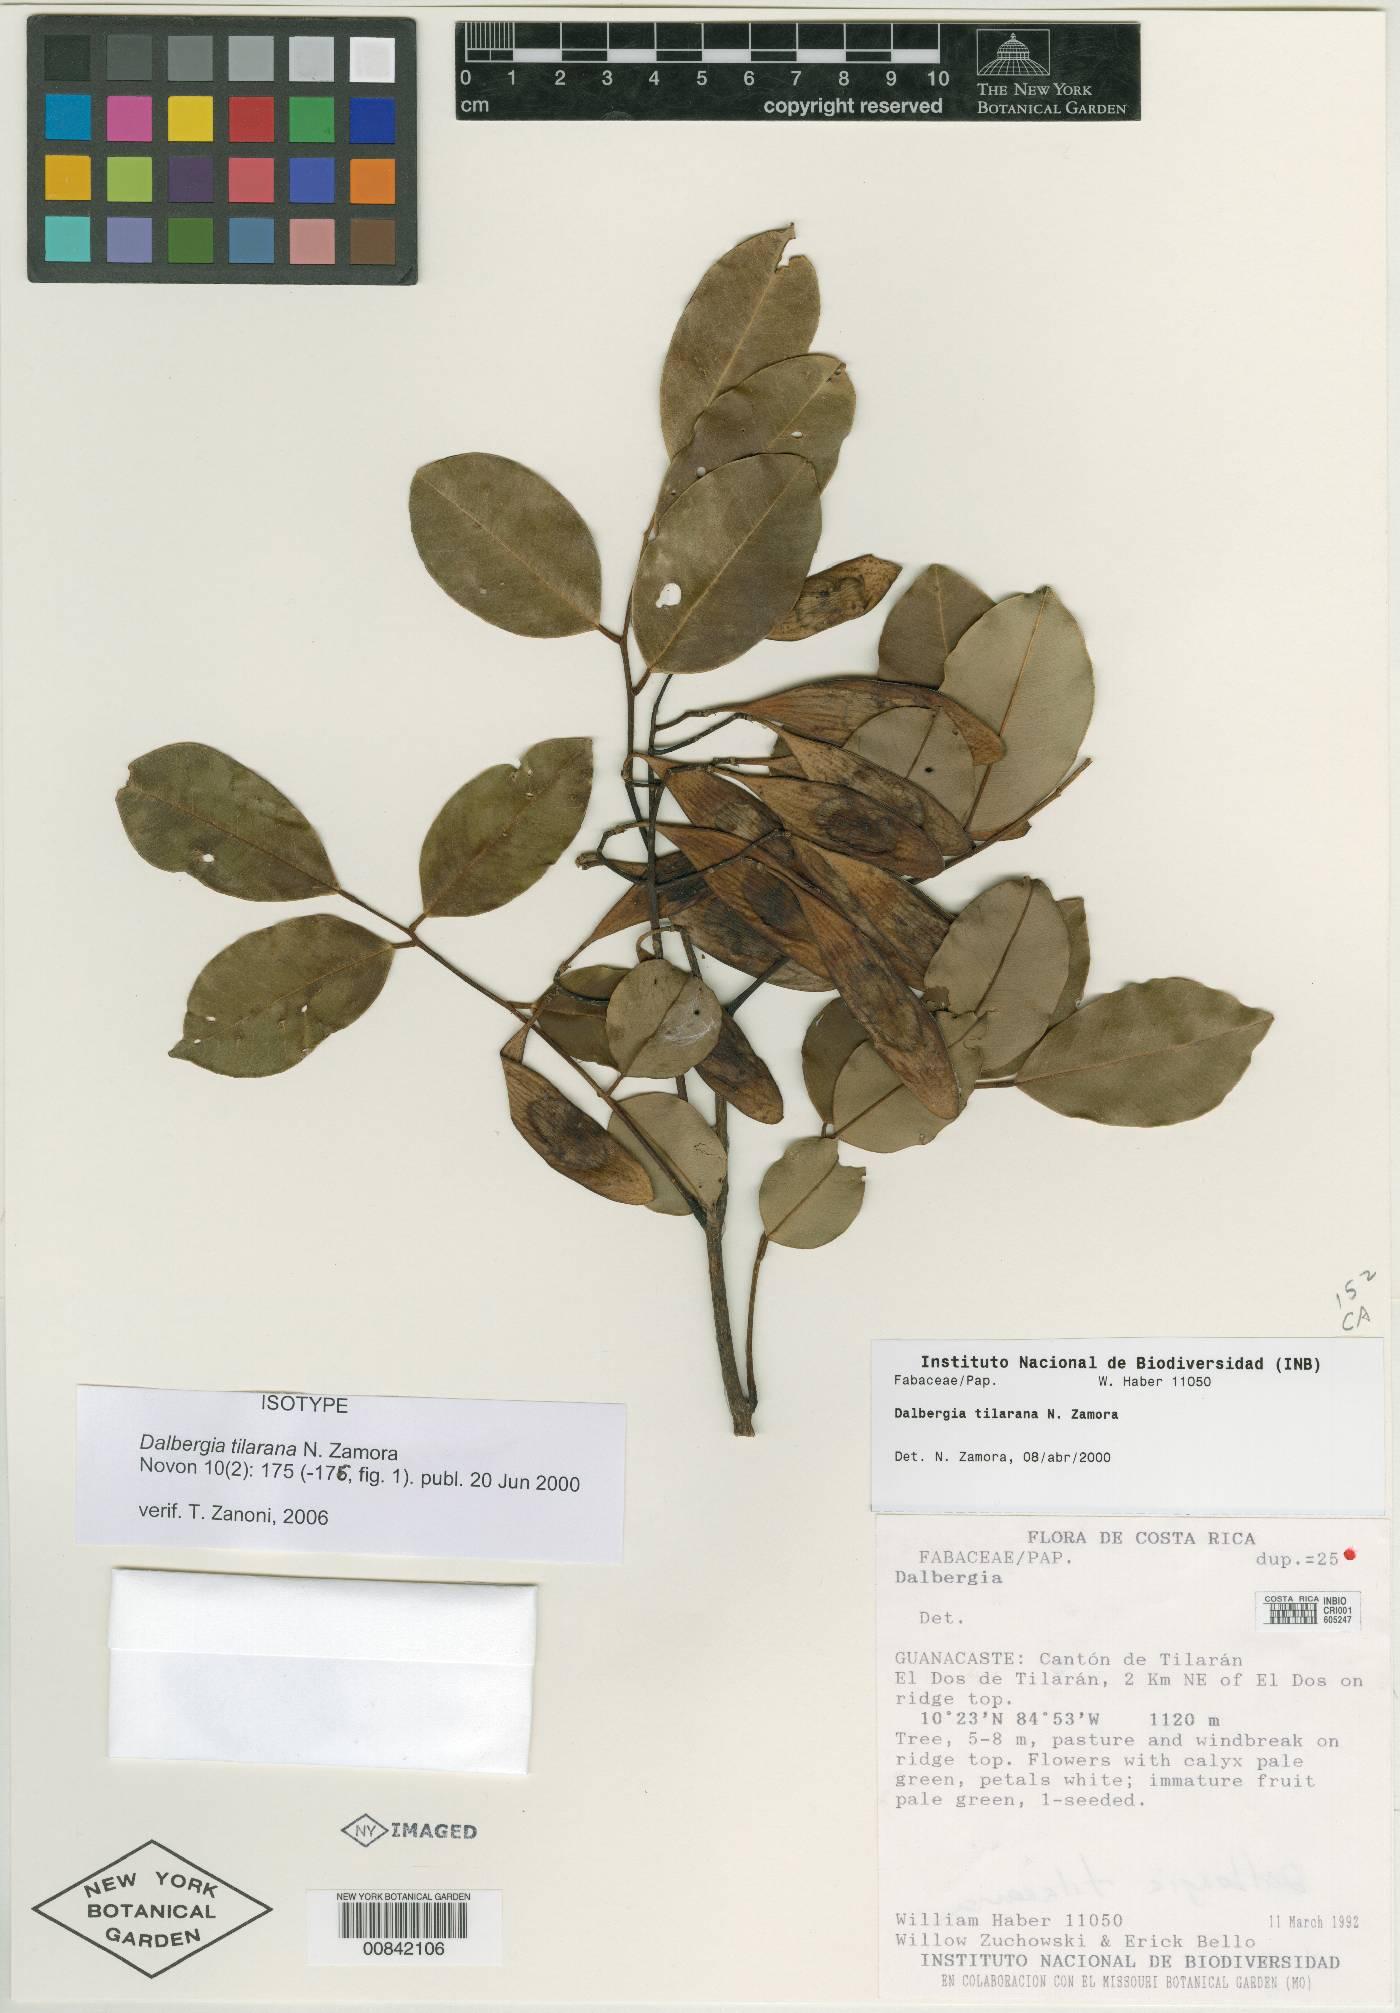 Dalbergia tilarana image